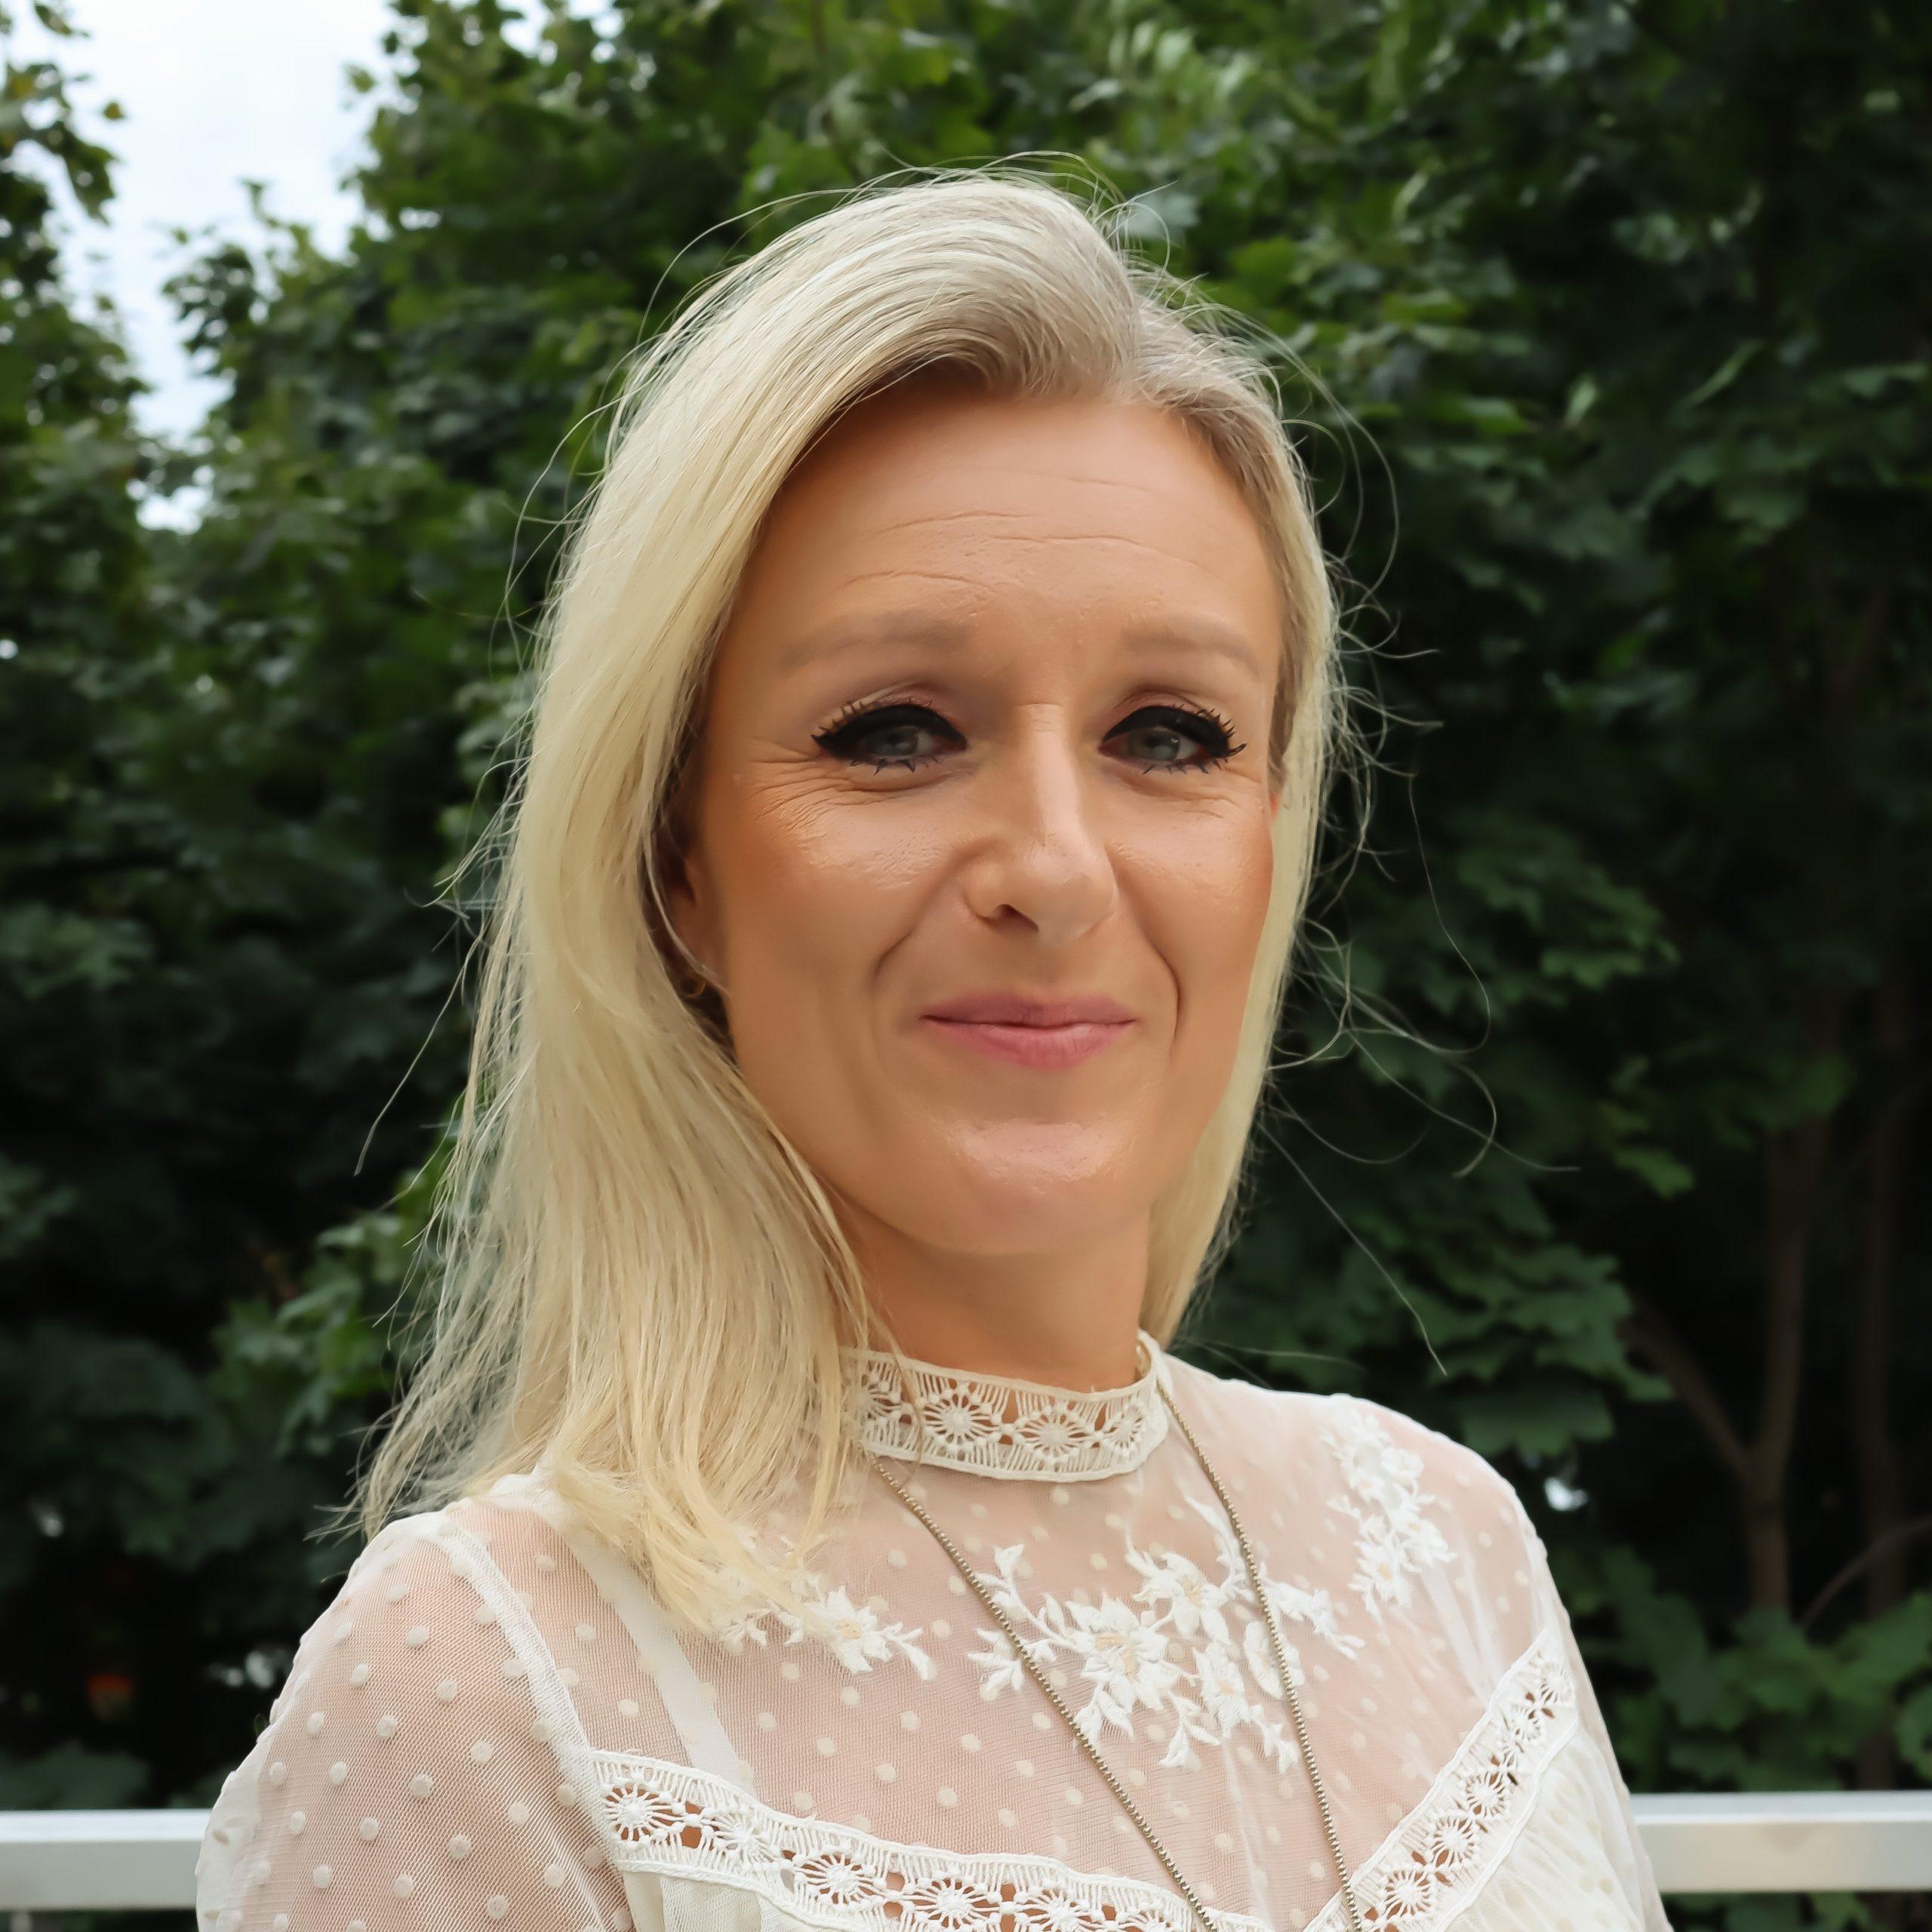 Olga Kerczmańska